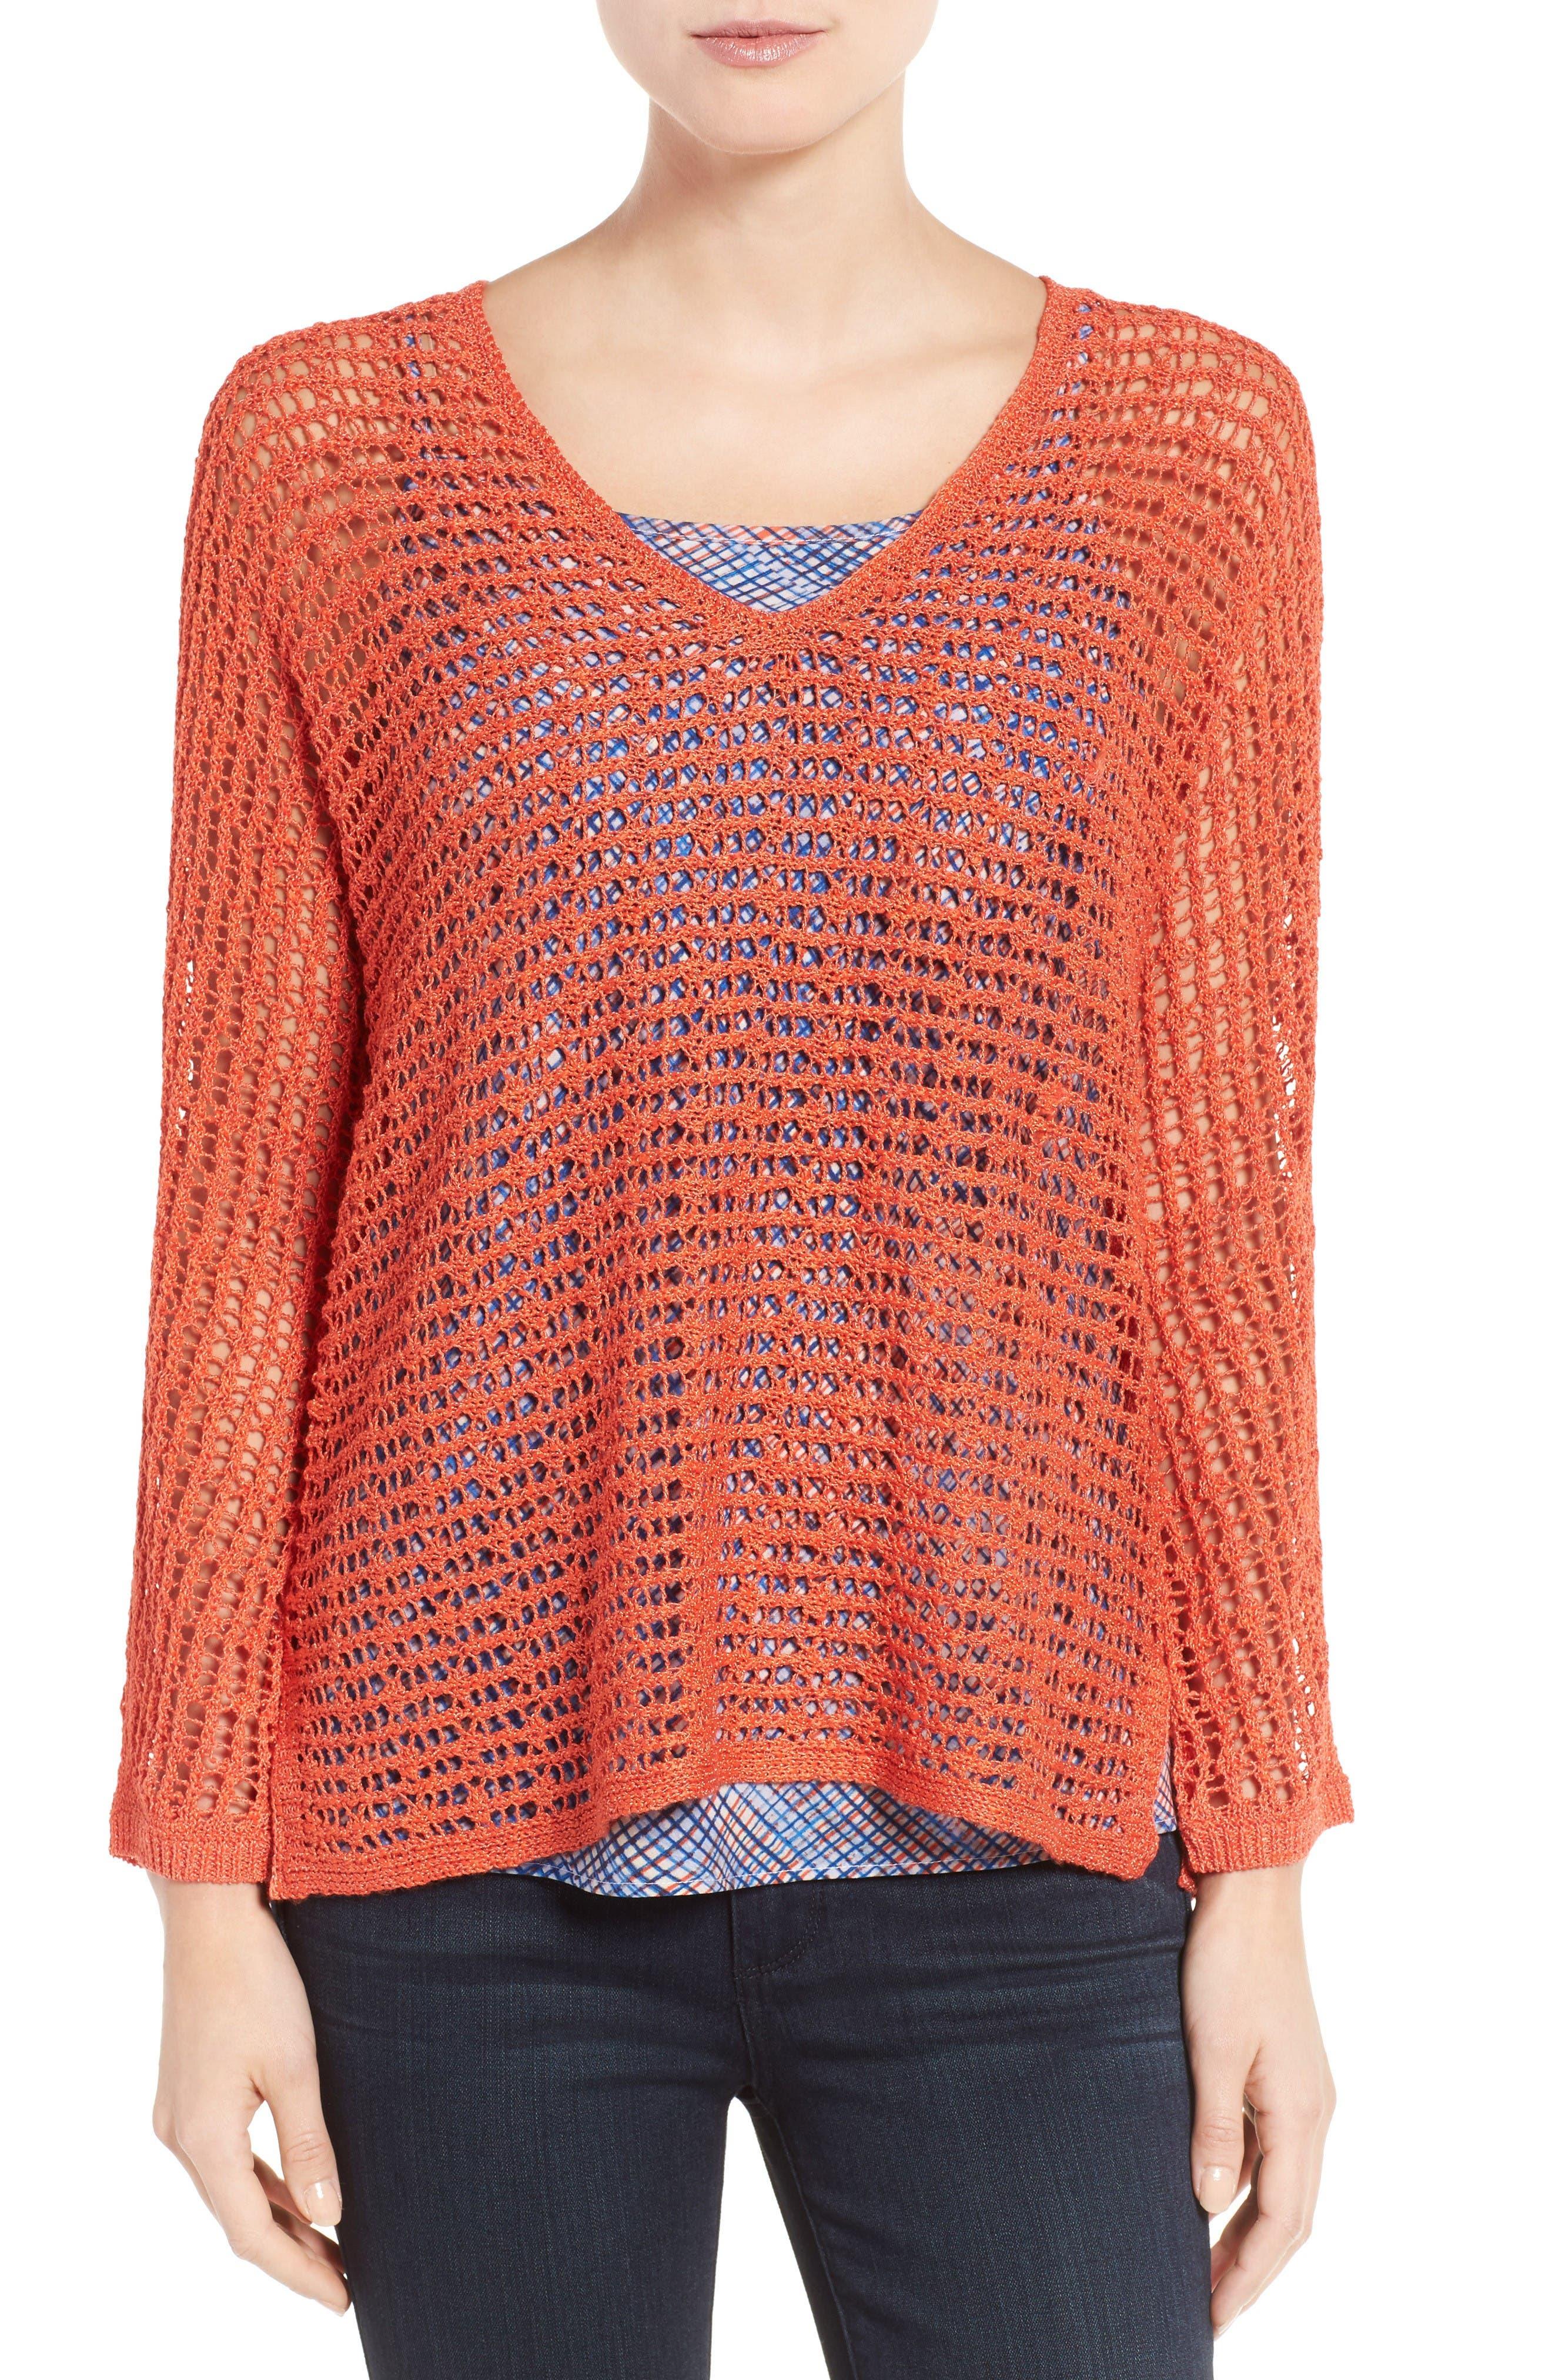 NIC+ZOE Sun Catcher Crochet Top (Regular & Petite)